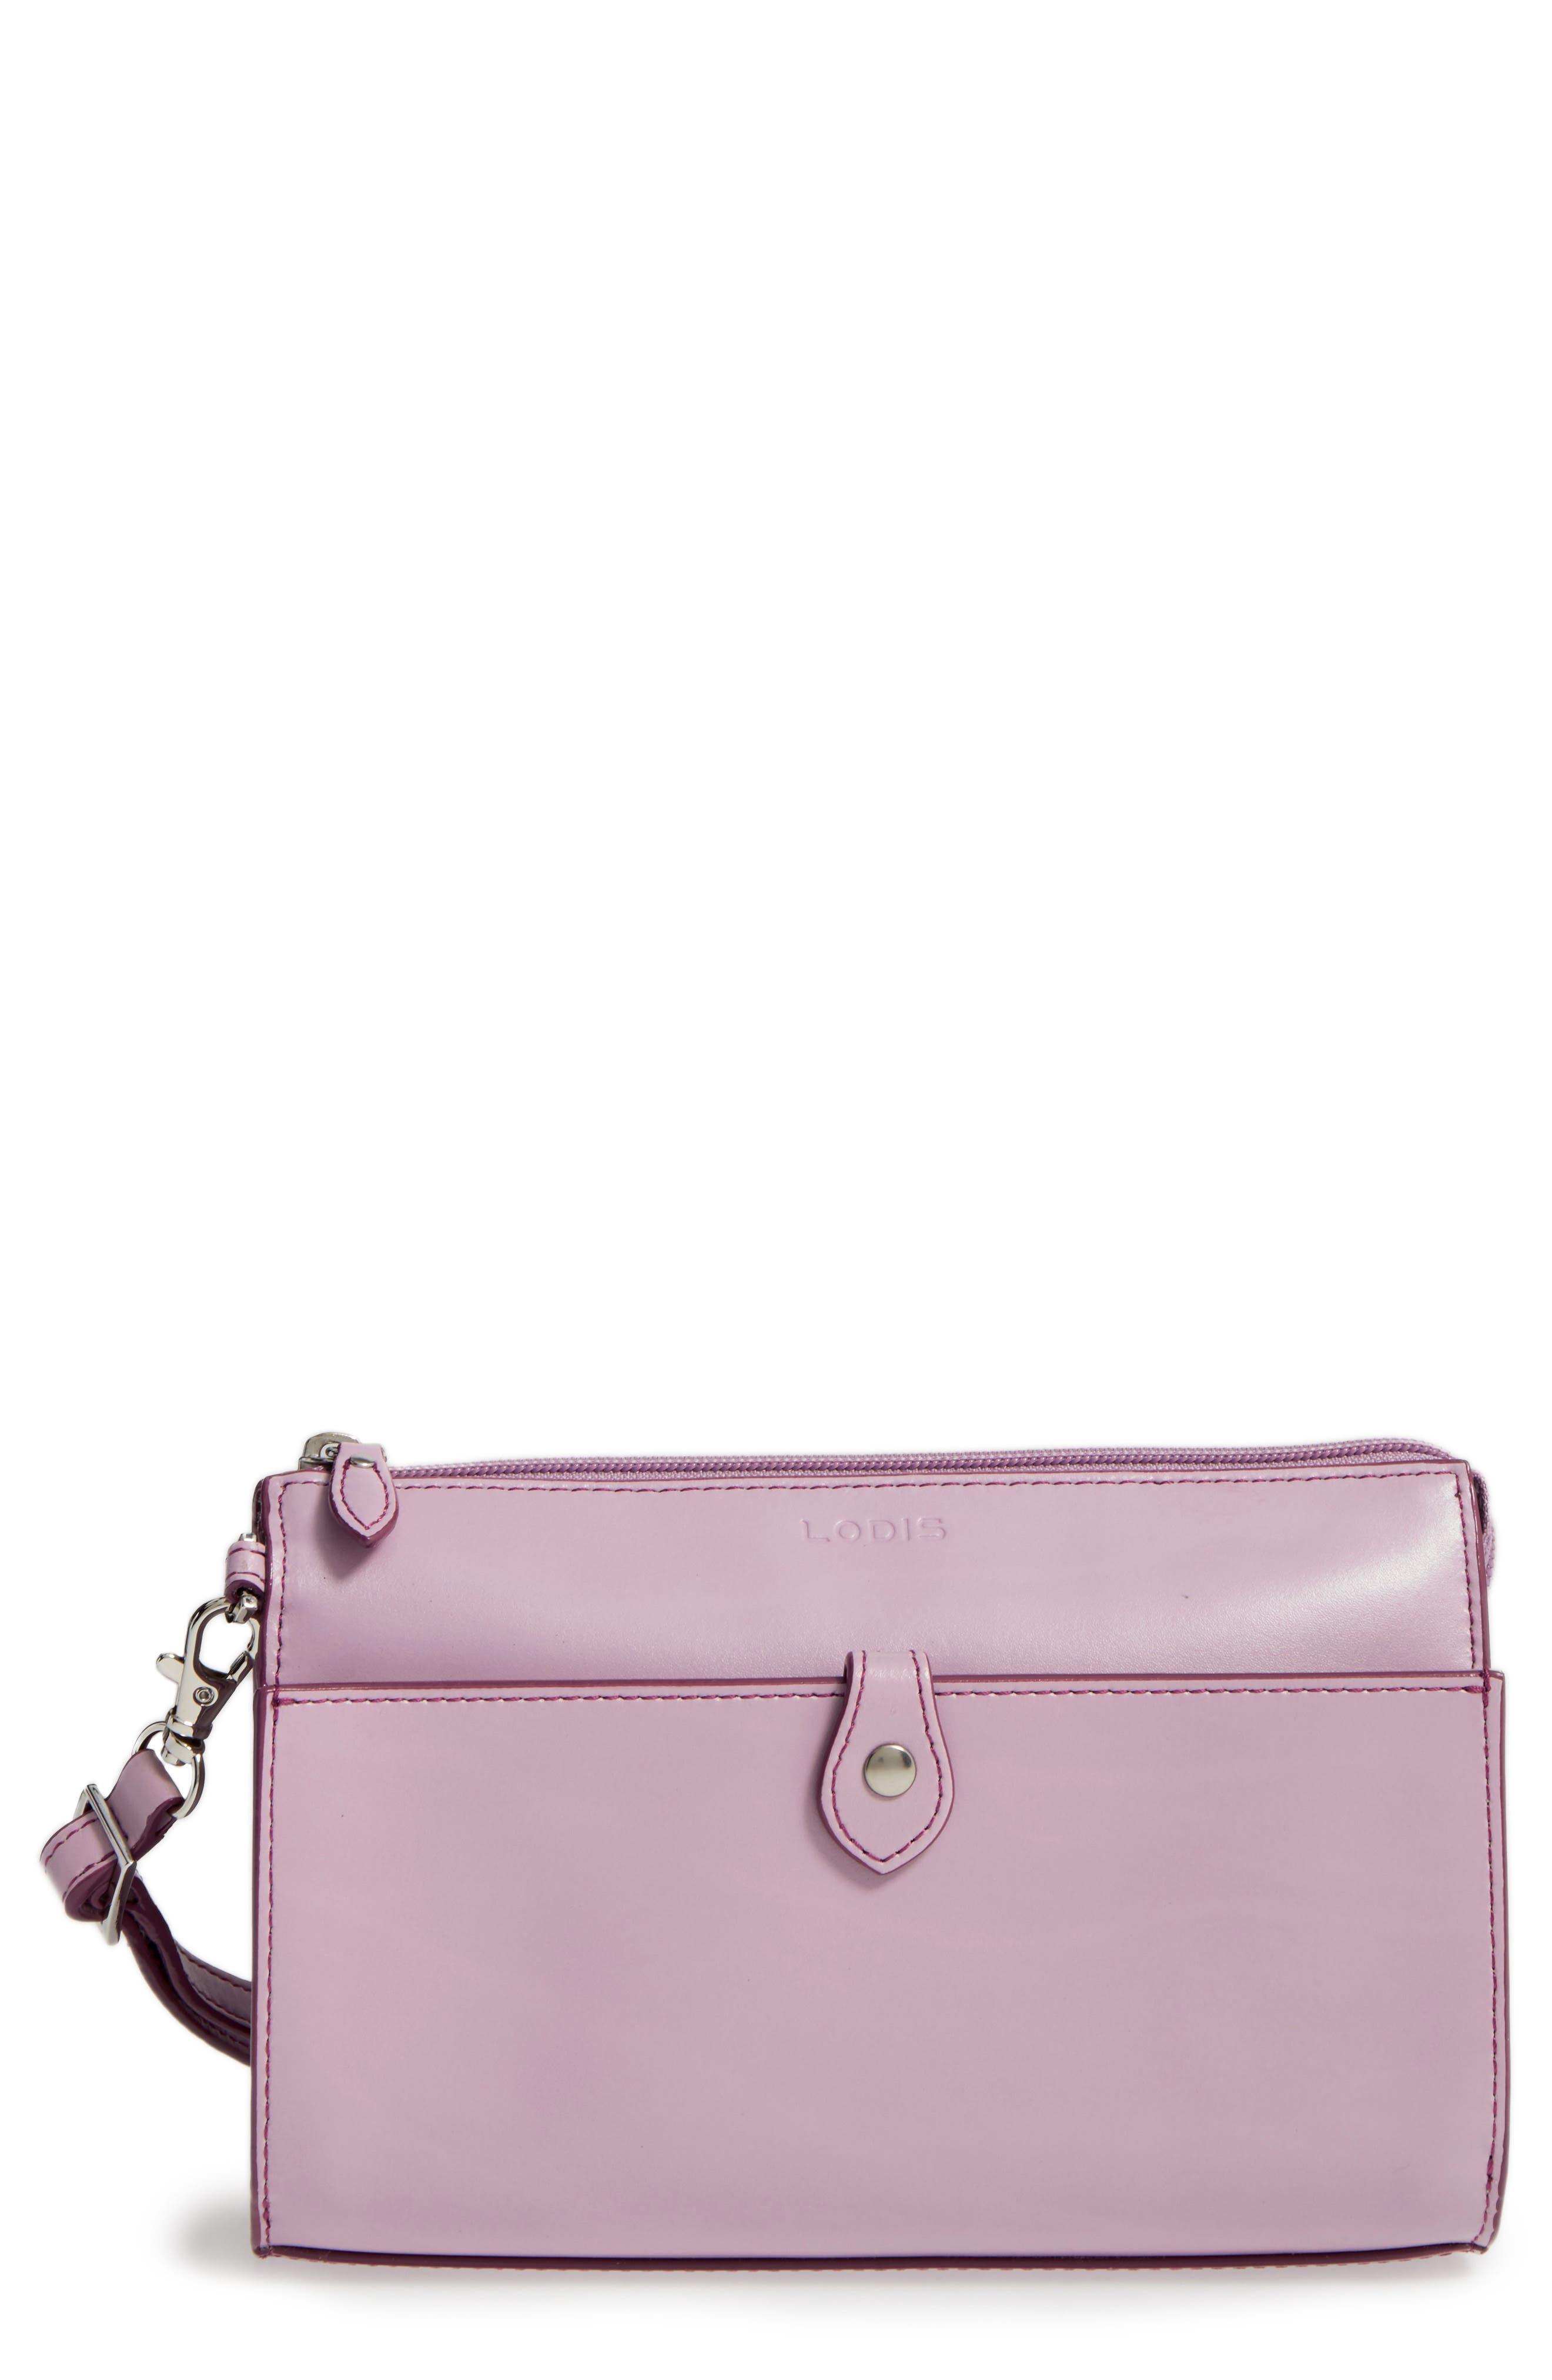 Lodis'Audrey Collection -Vicky' ConvertibleCrossbody Bag,                             Main thumbnail 5, color,